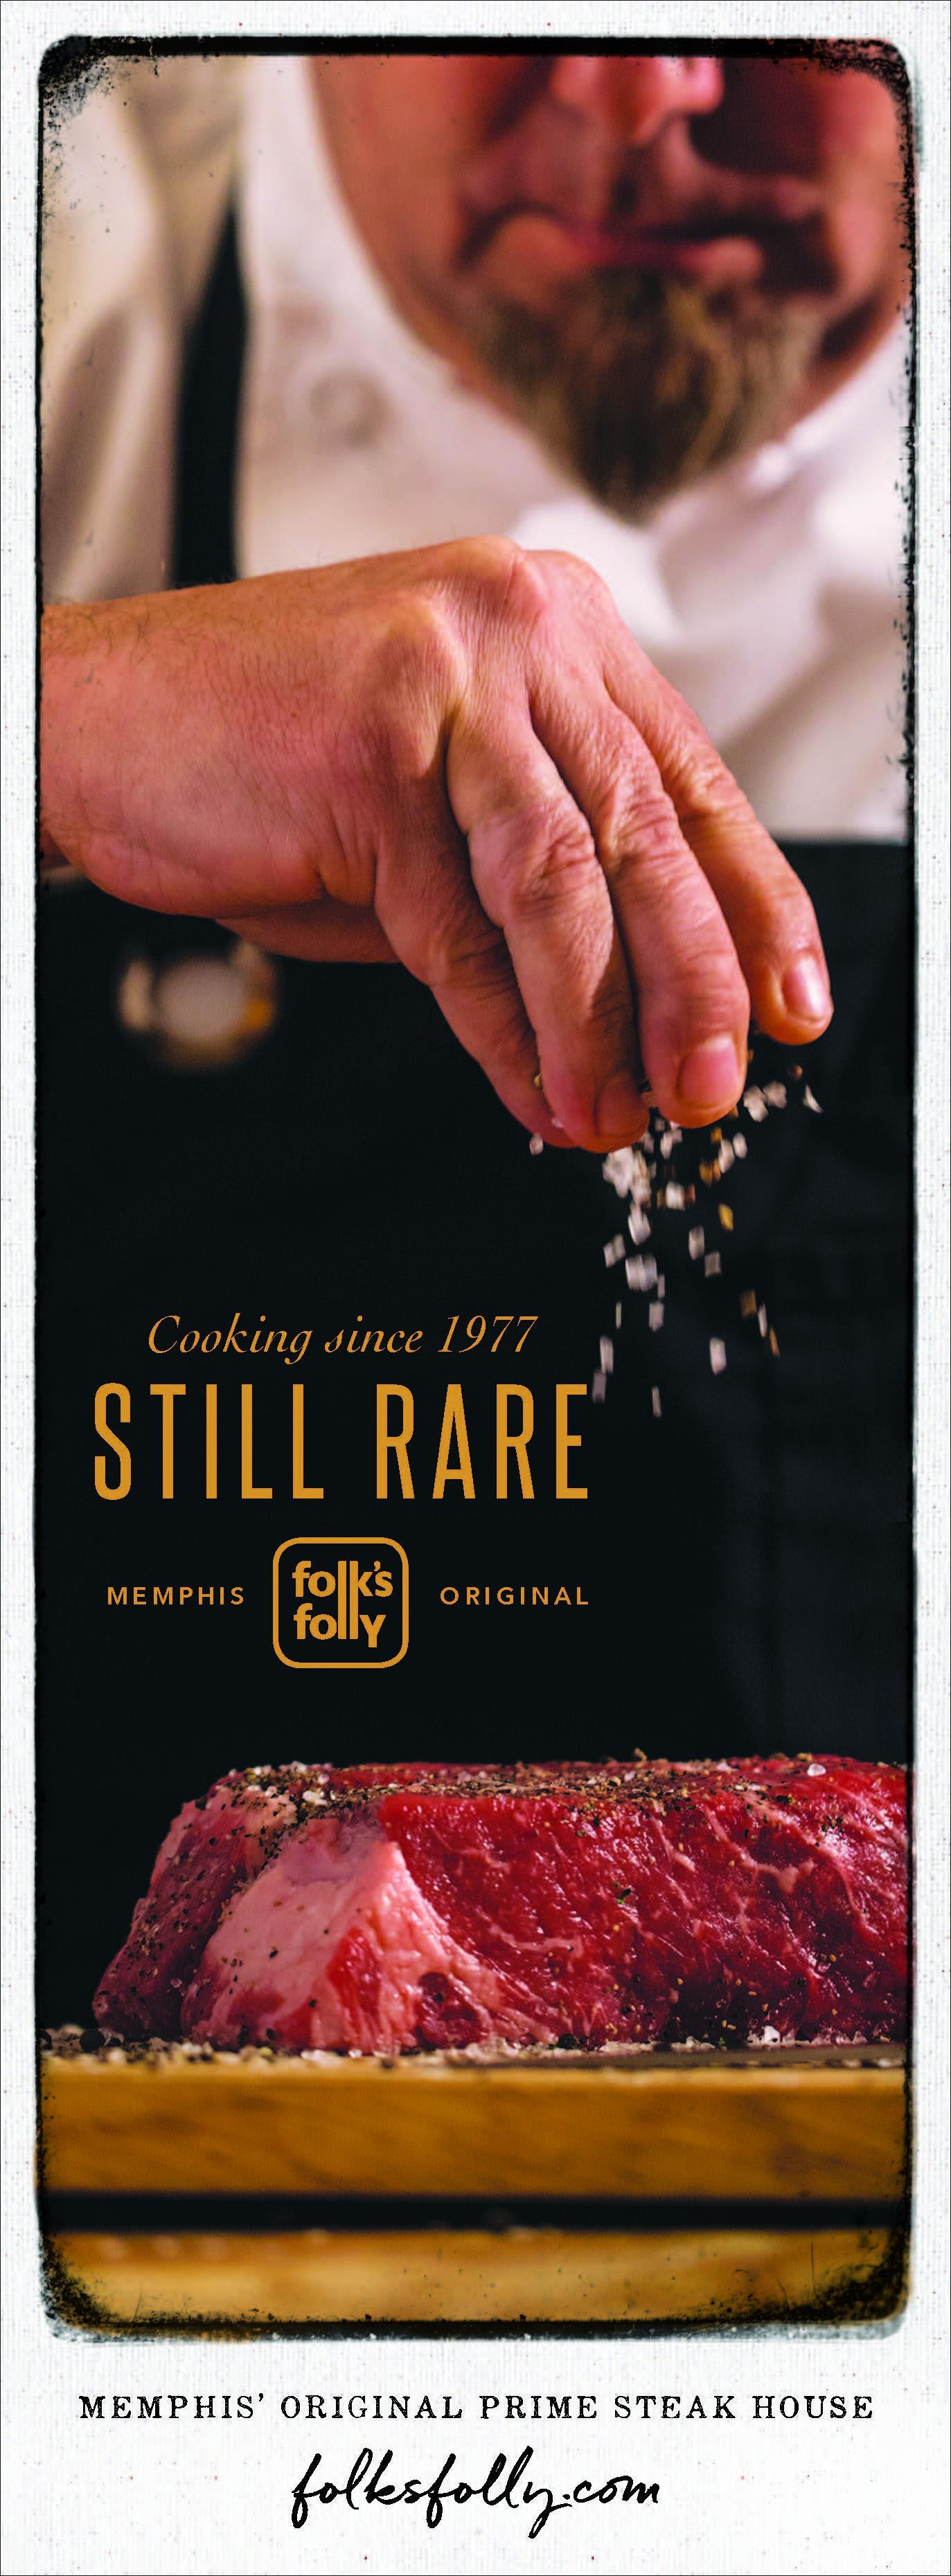 Folk's Folly Steak House Campaign_Page_3.jpg